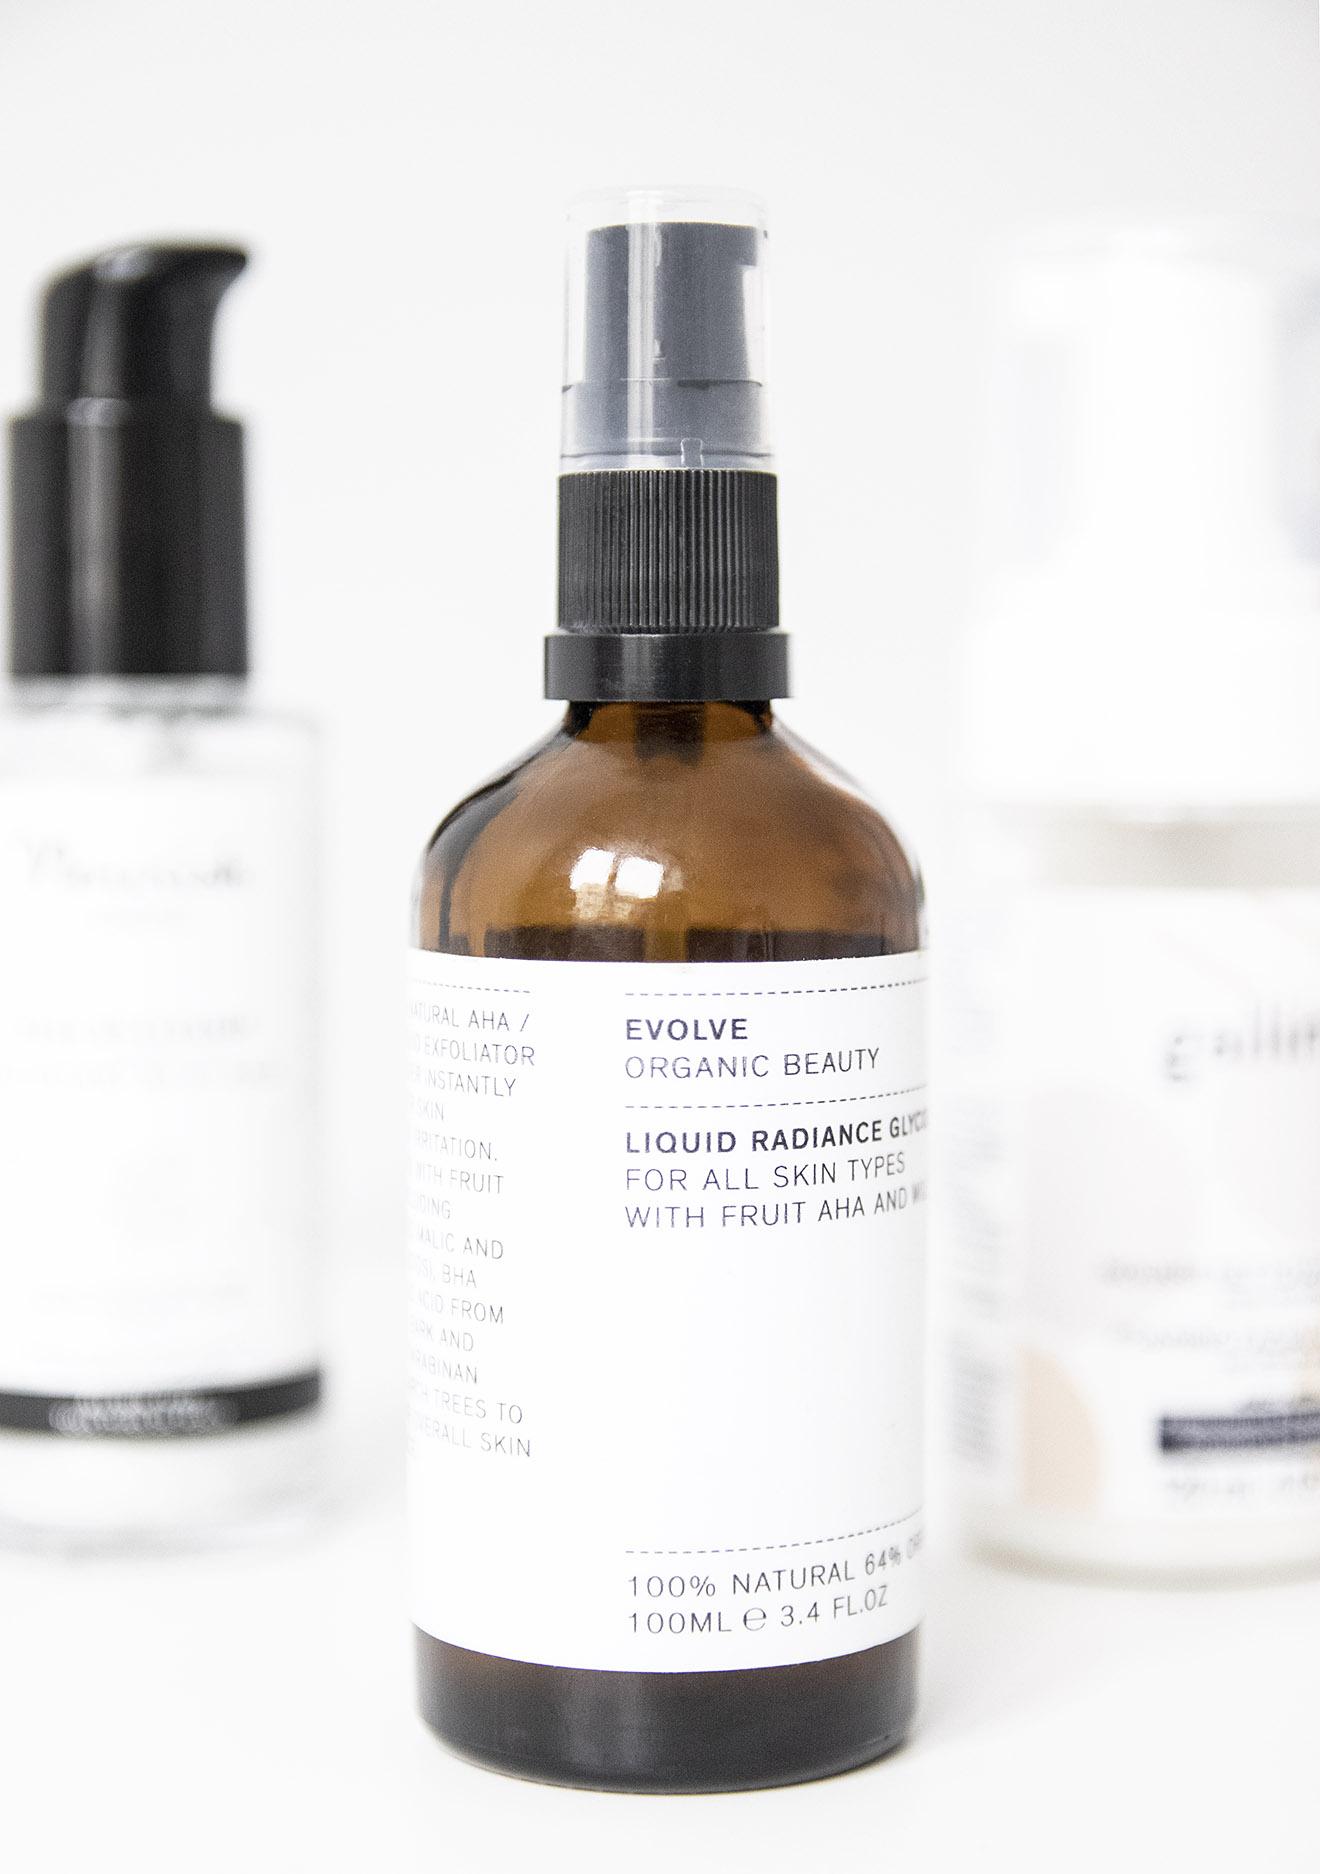 Evolve Organic Beauty Liquid Radiance Glycolic Toner